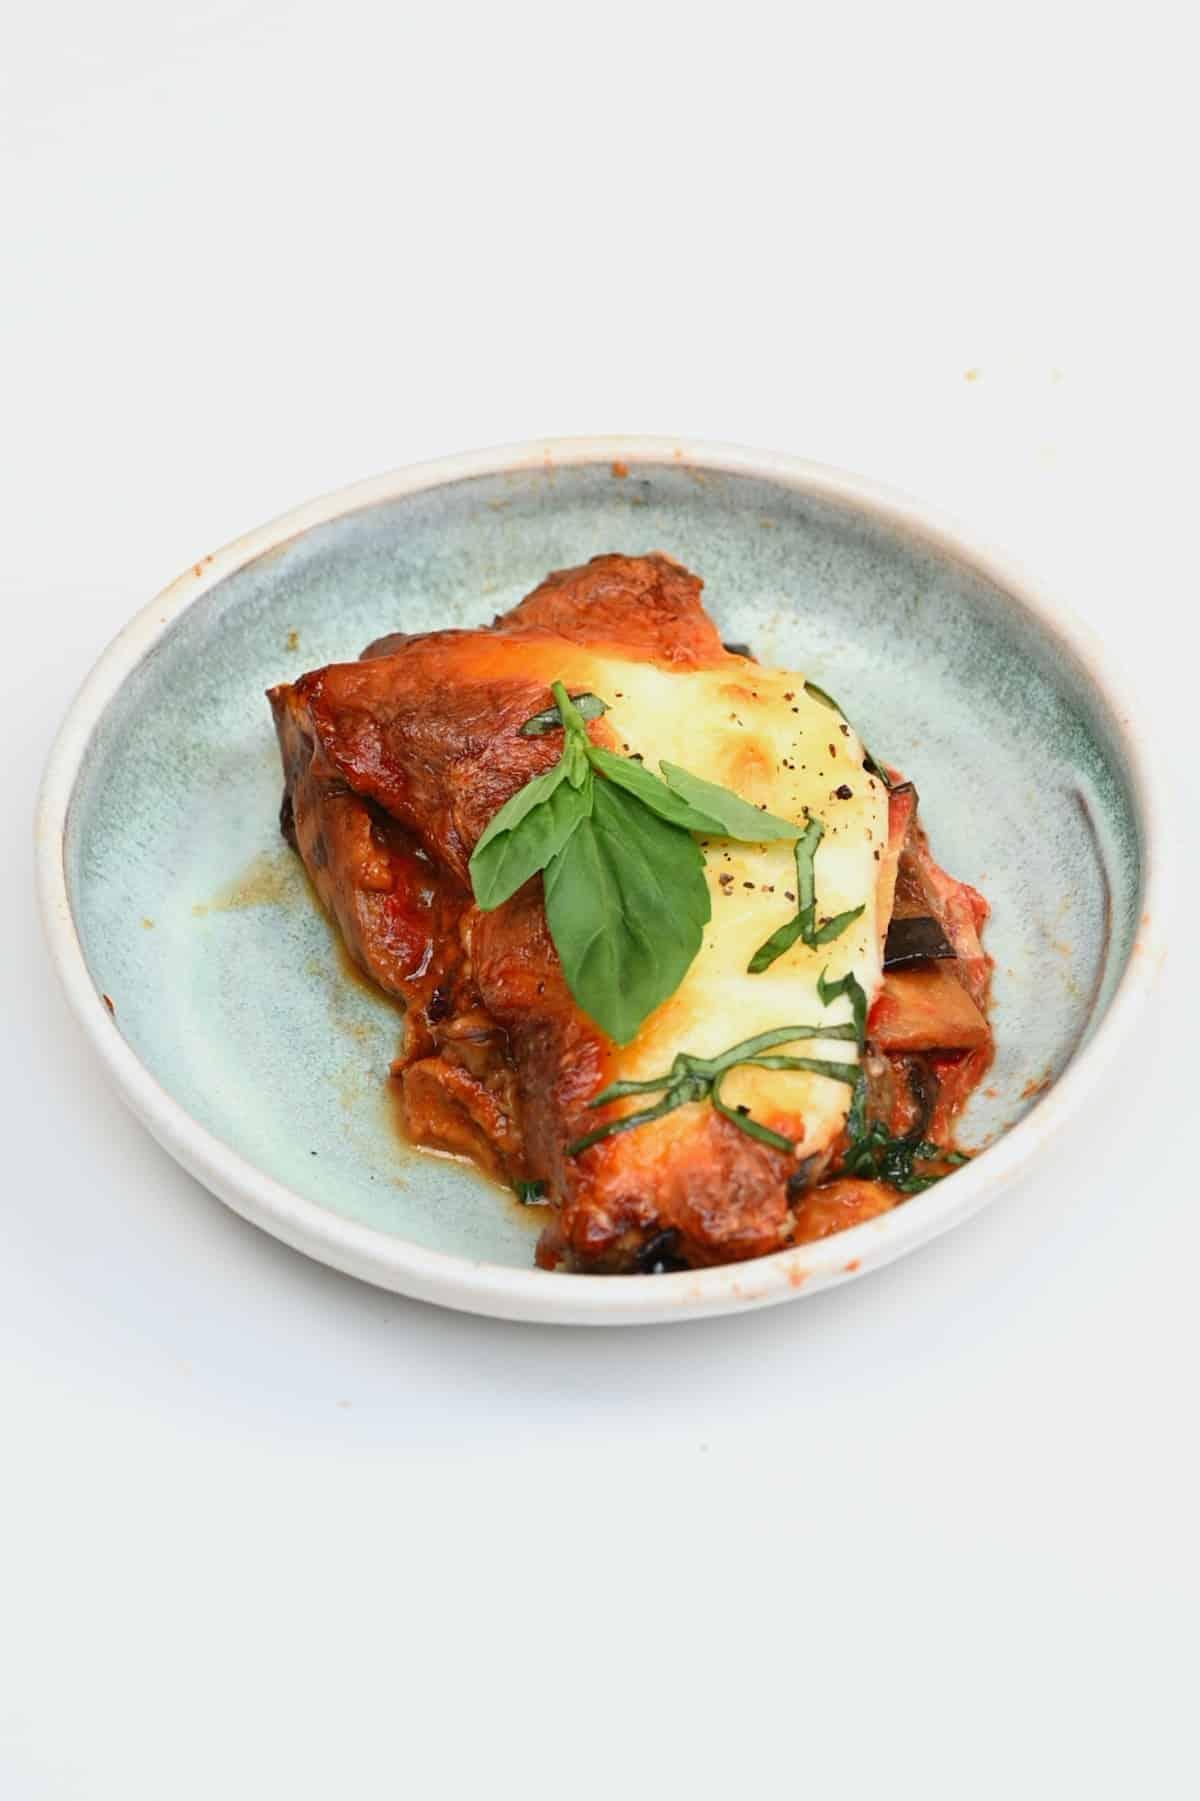 A slice of parmigiana